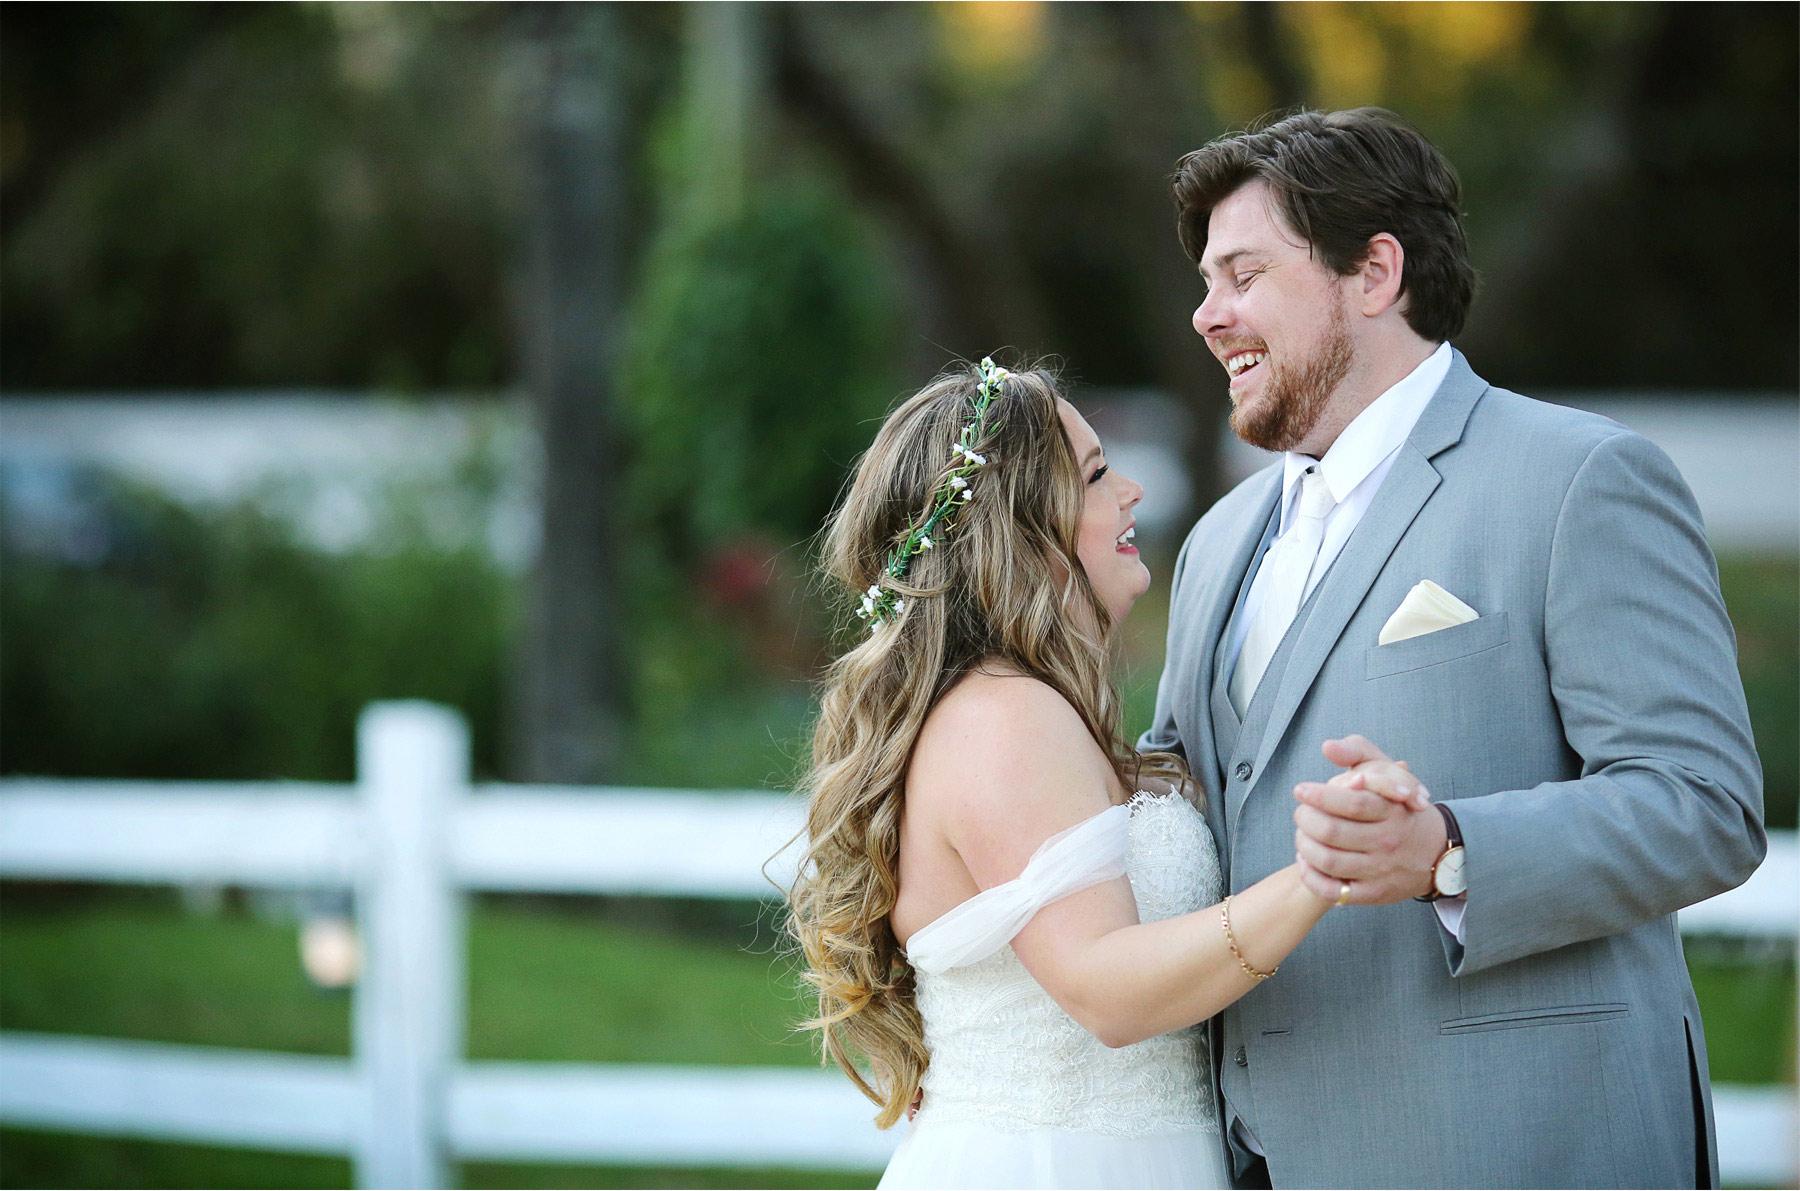 25-Brandon-Florida-Wedding-Photographer-by-Andrew-Vick-Photography-Casa-Lantana-Spring-Reception-Bride-Groom-Dance-Kristianna-and-Ben.jpg